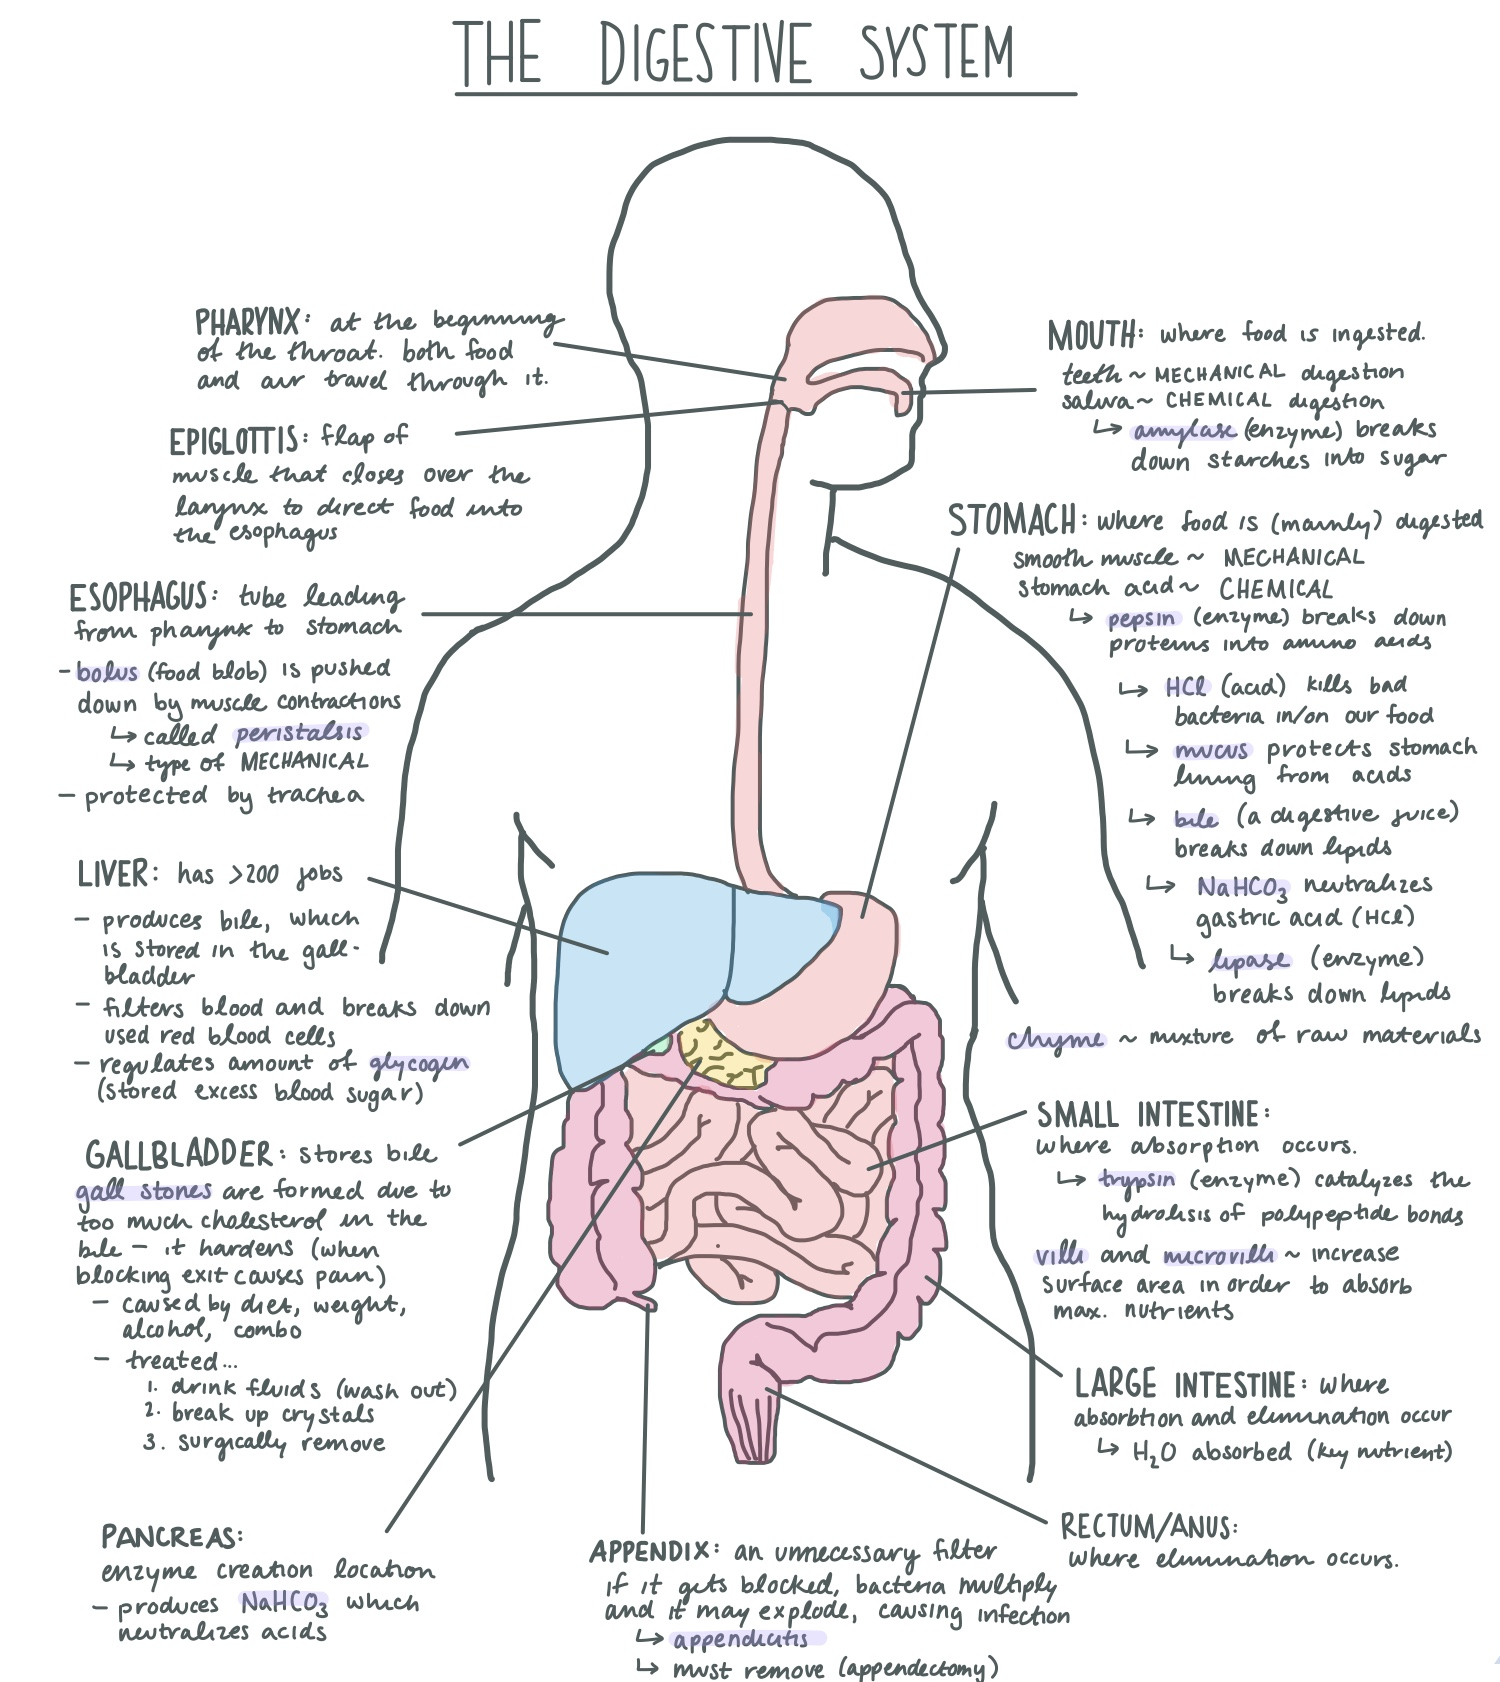 Digestive System Diagram Filedigestive System Diagram Wikimedia Commons